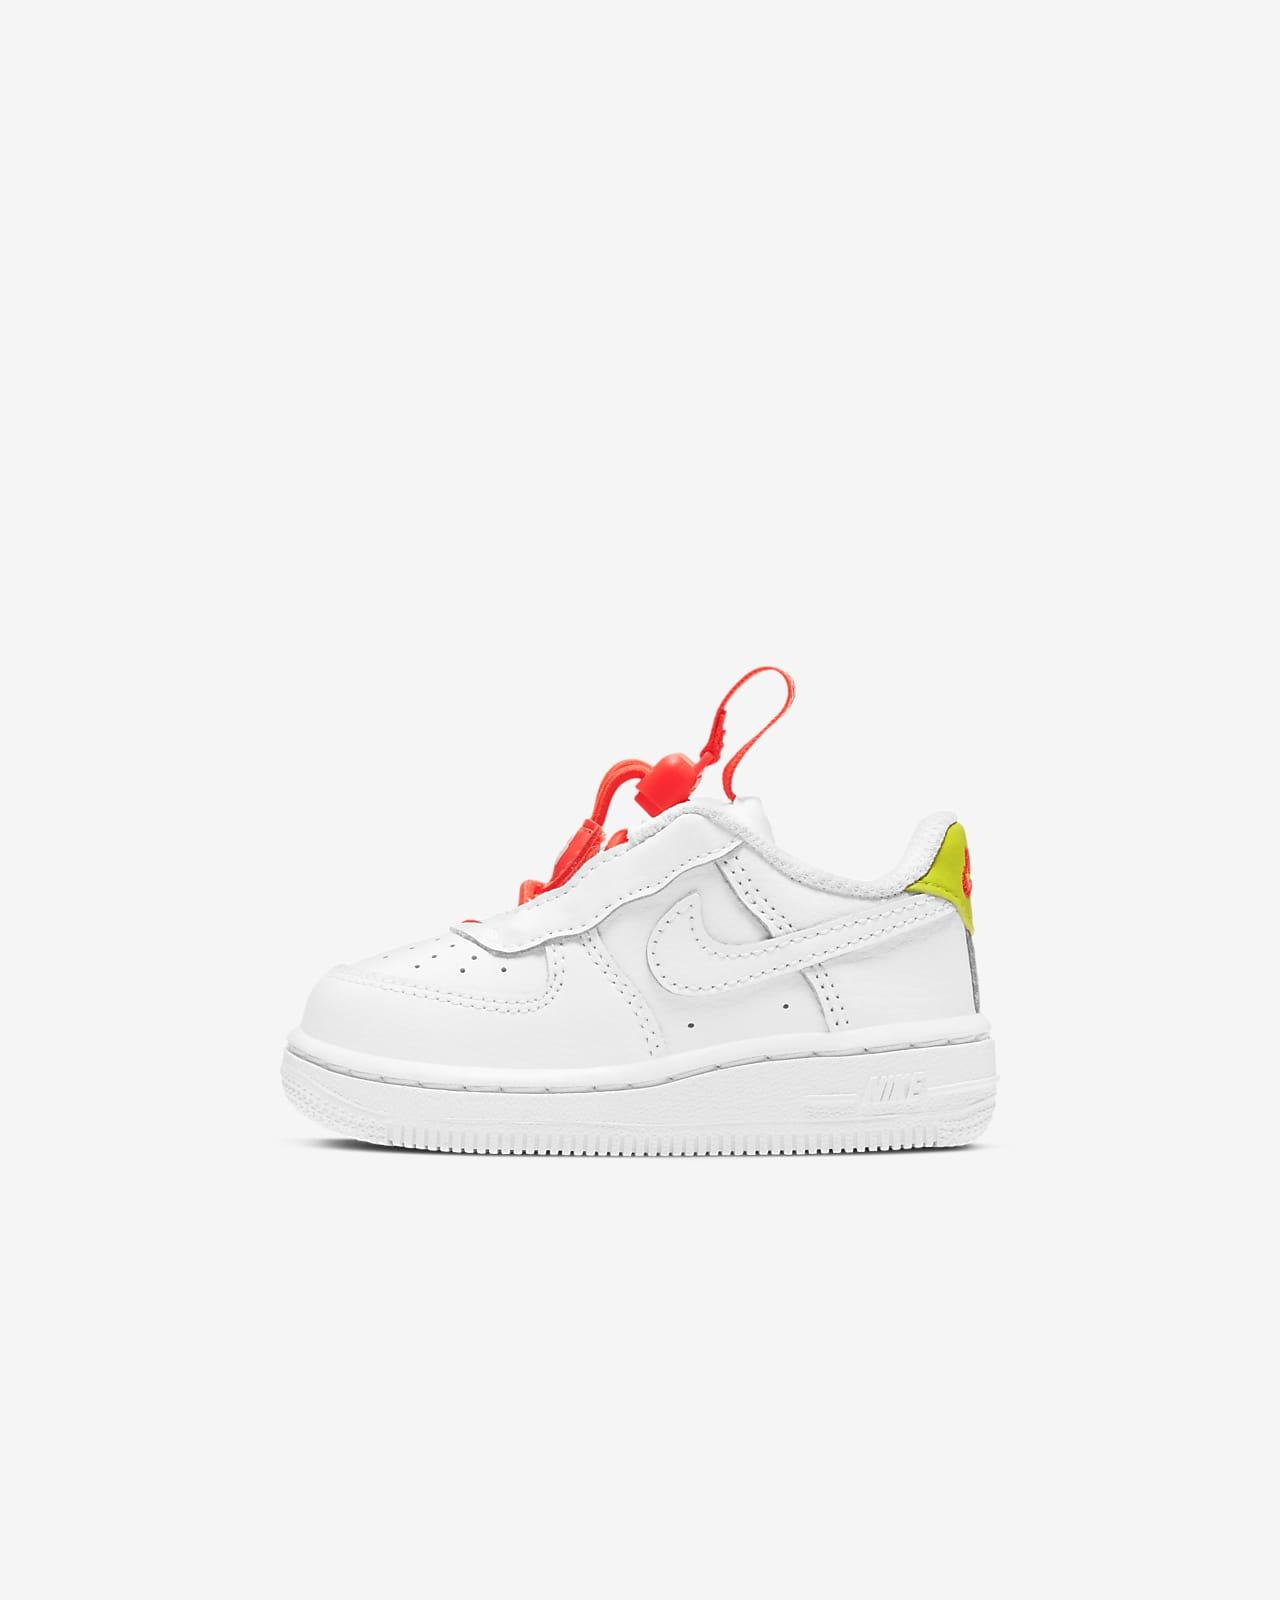 Nike Force 1 Toggle sko til sped-/småbarn